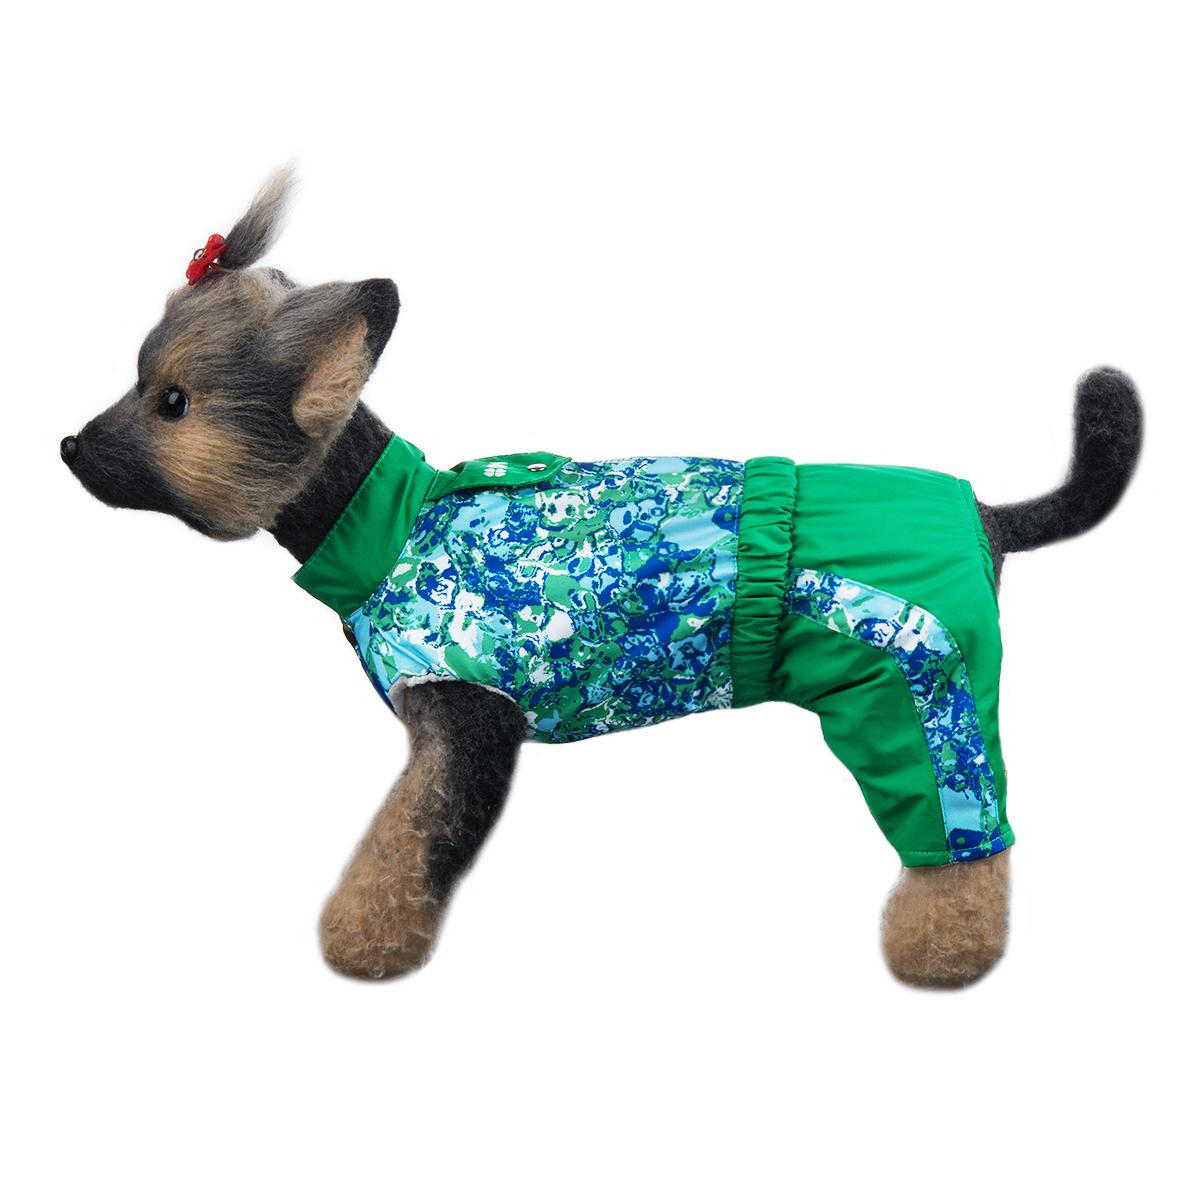 Комбинезон для собак Dogmoda Грин, унисекс, цвет: зеленый, синий, белый. Размер 2 (M) комбинезон для собак dogmoda мегаполис унисекс цвет синий размер xxl